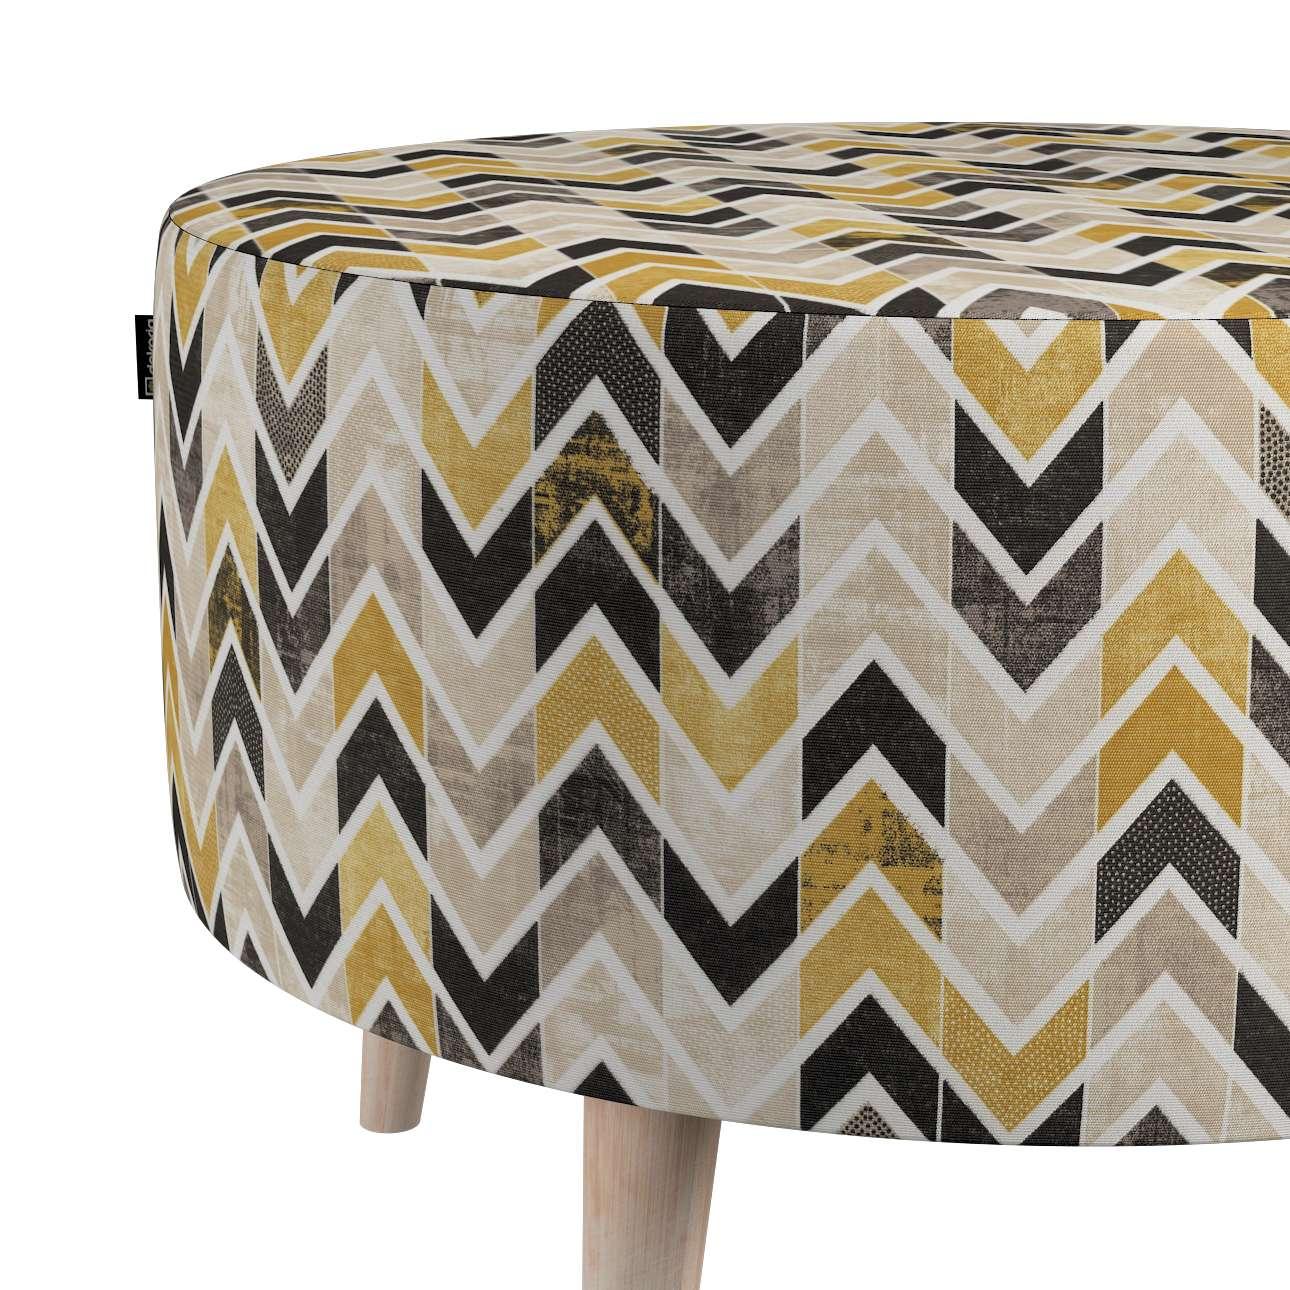 Podnóżek okrągły natural w kolekcji Modern, tkanina: 142-79